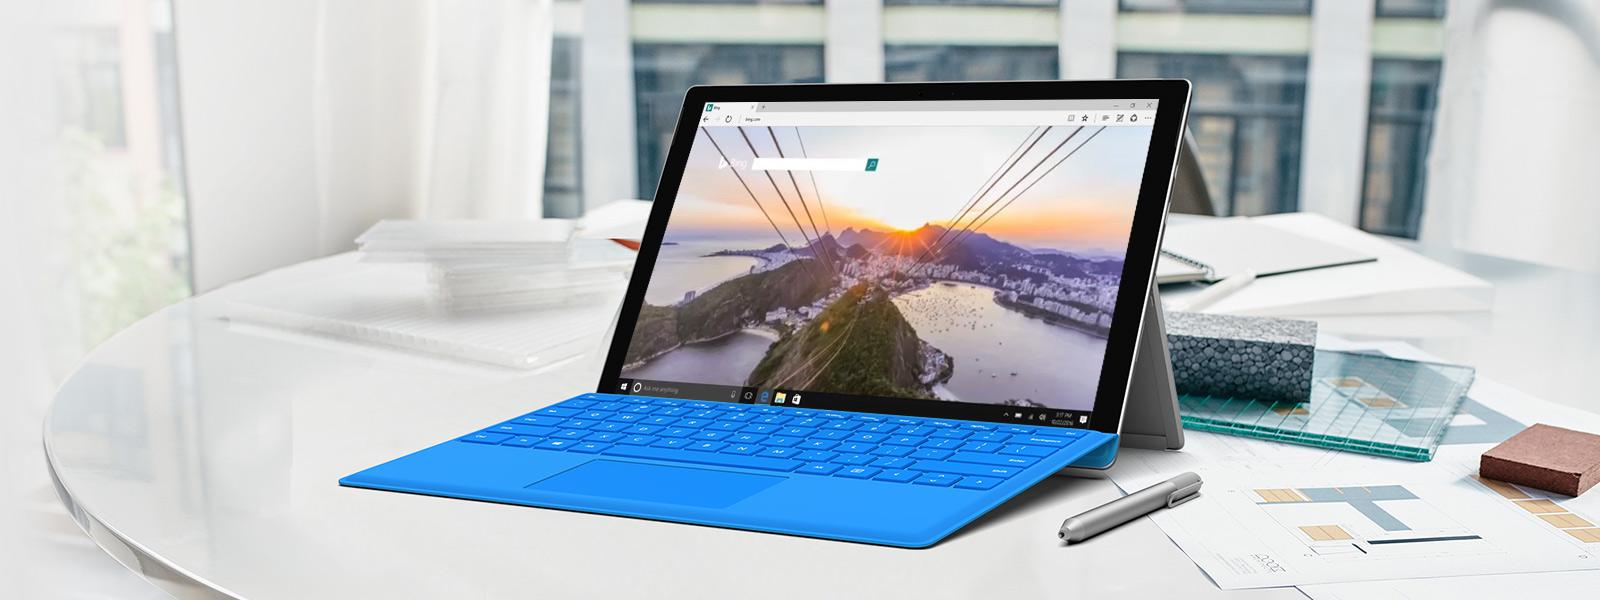 Microsoft Edge showing a Bing search screen